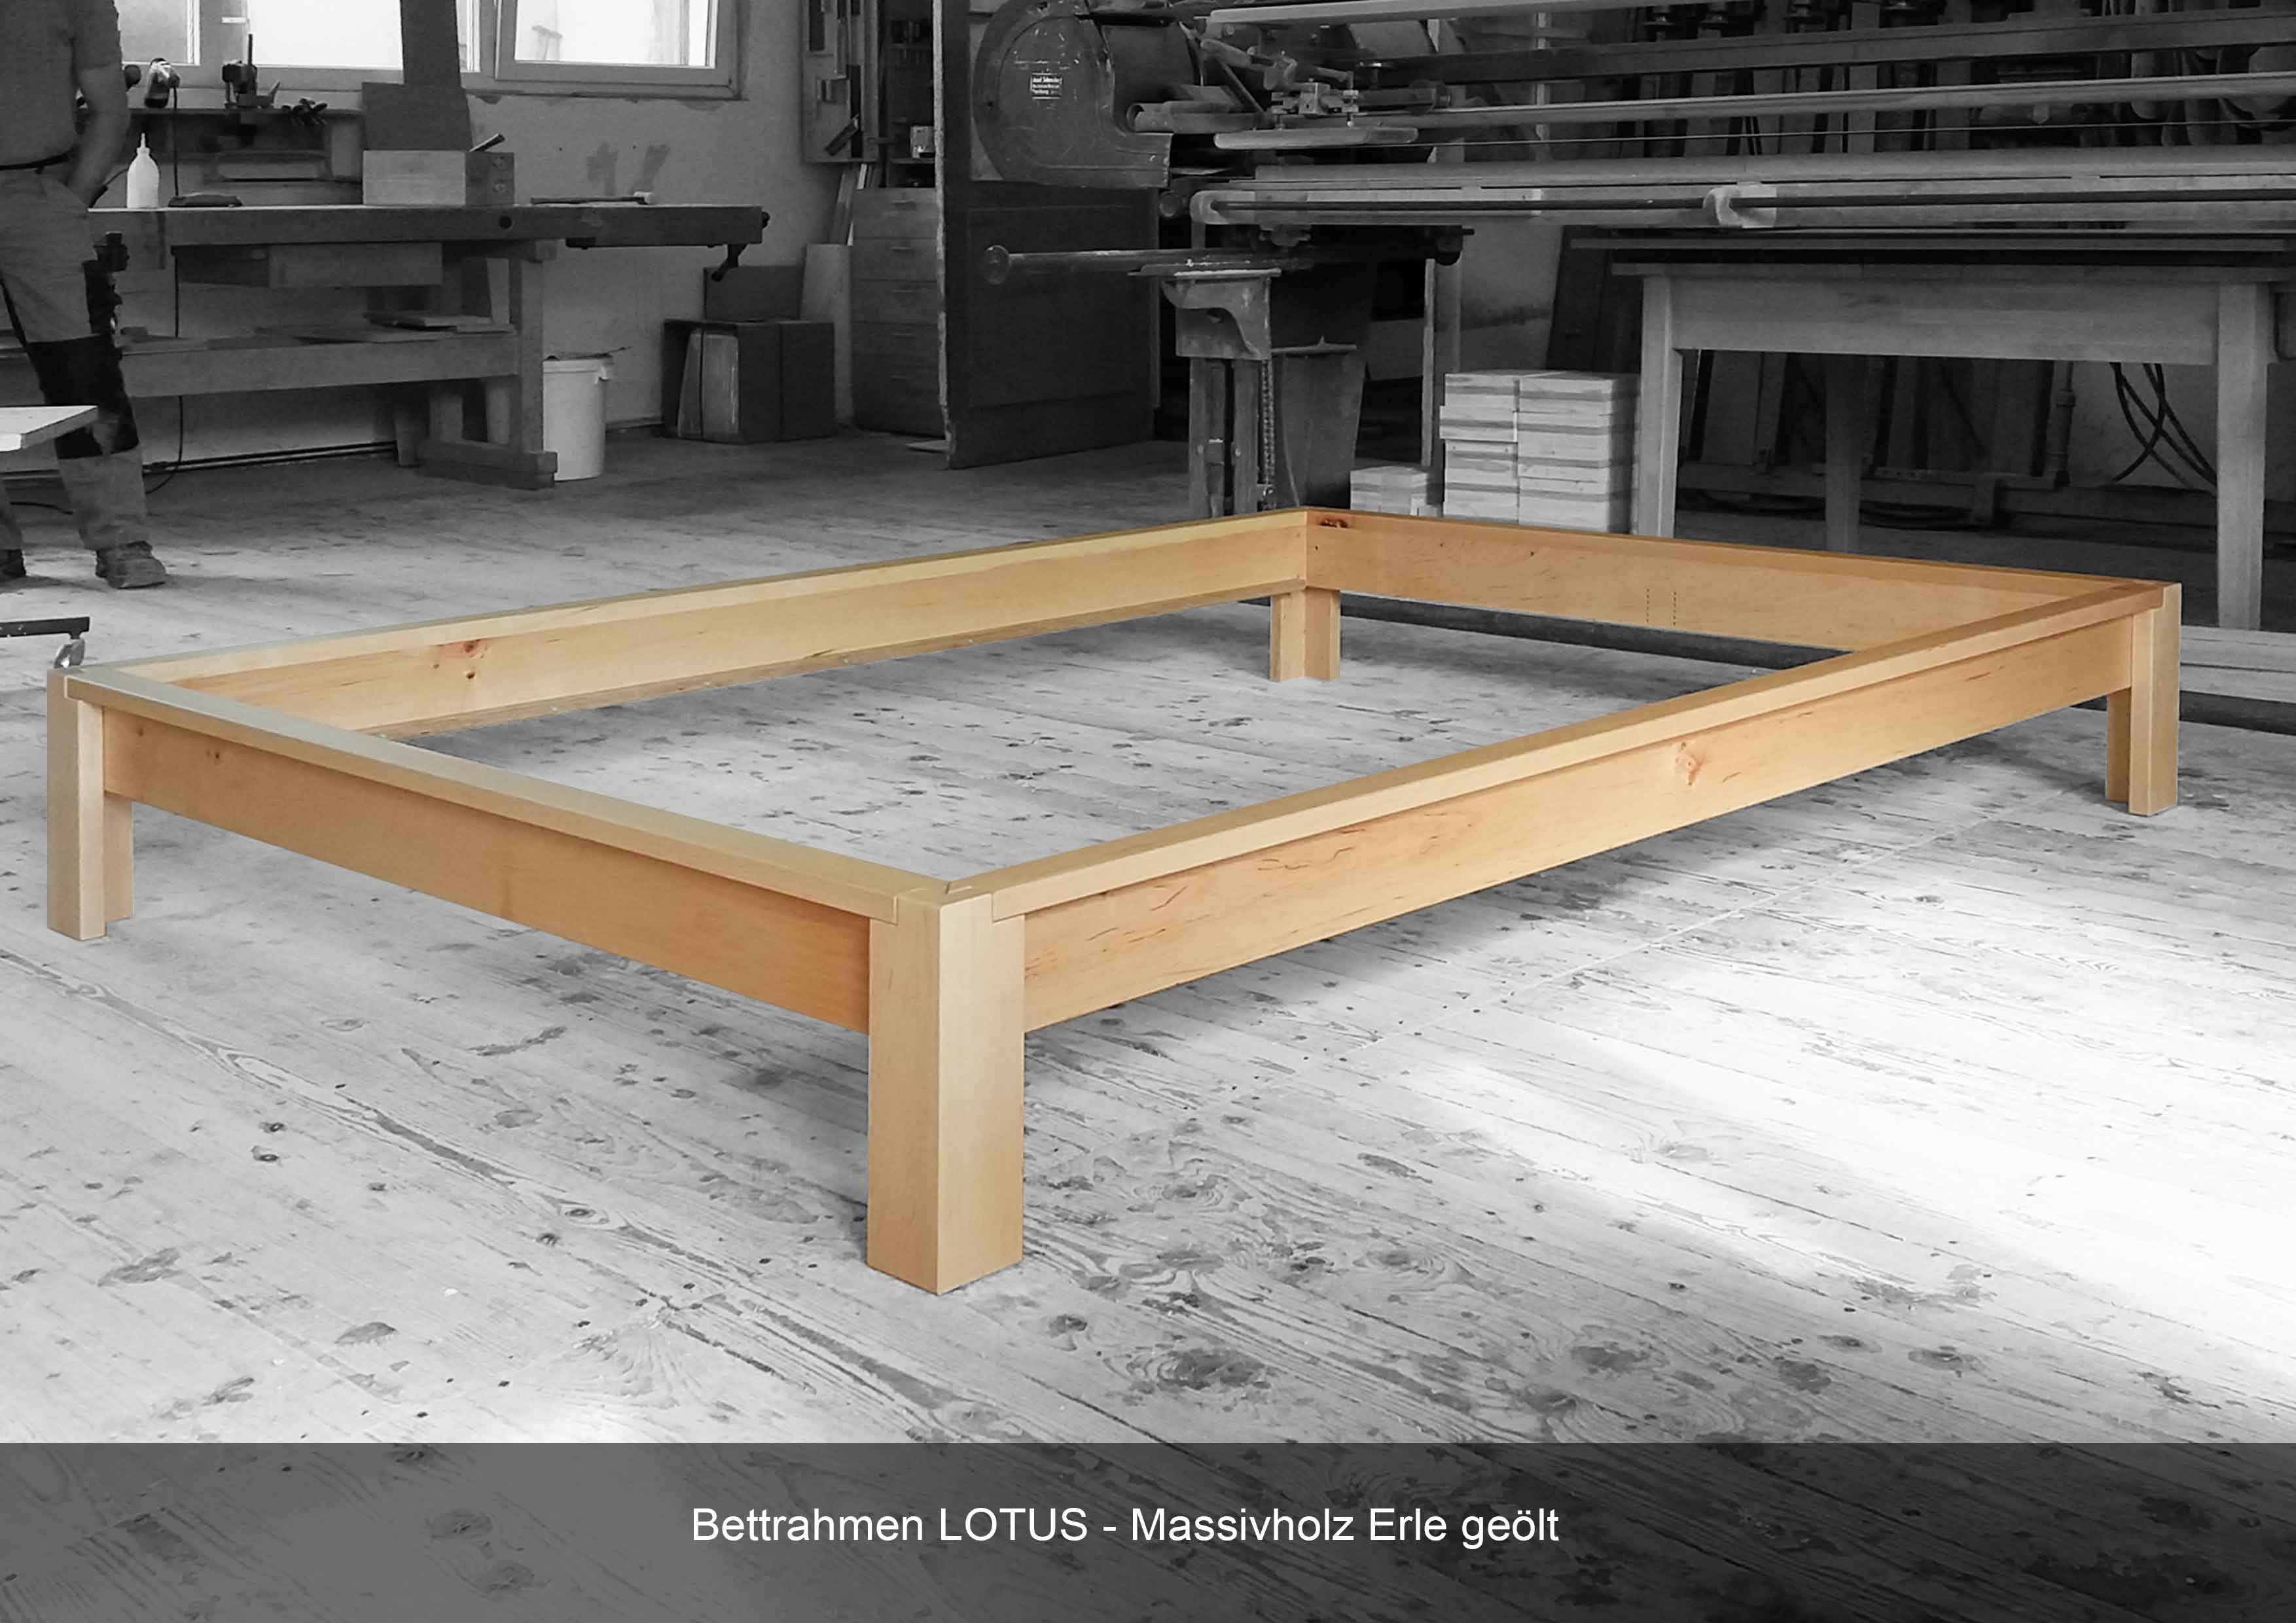 Bettrahmen in 'Erle Massivholz in Werkstatt